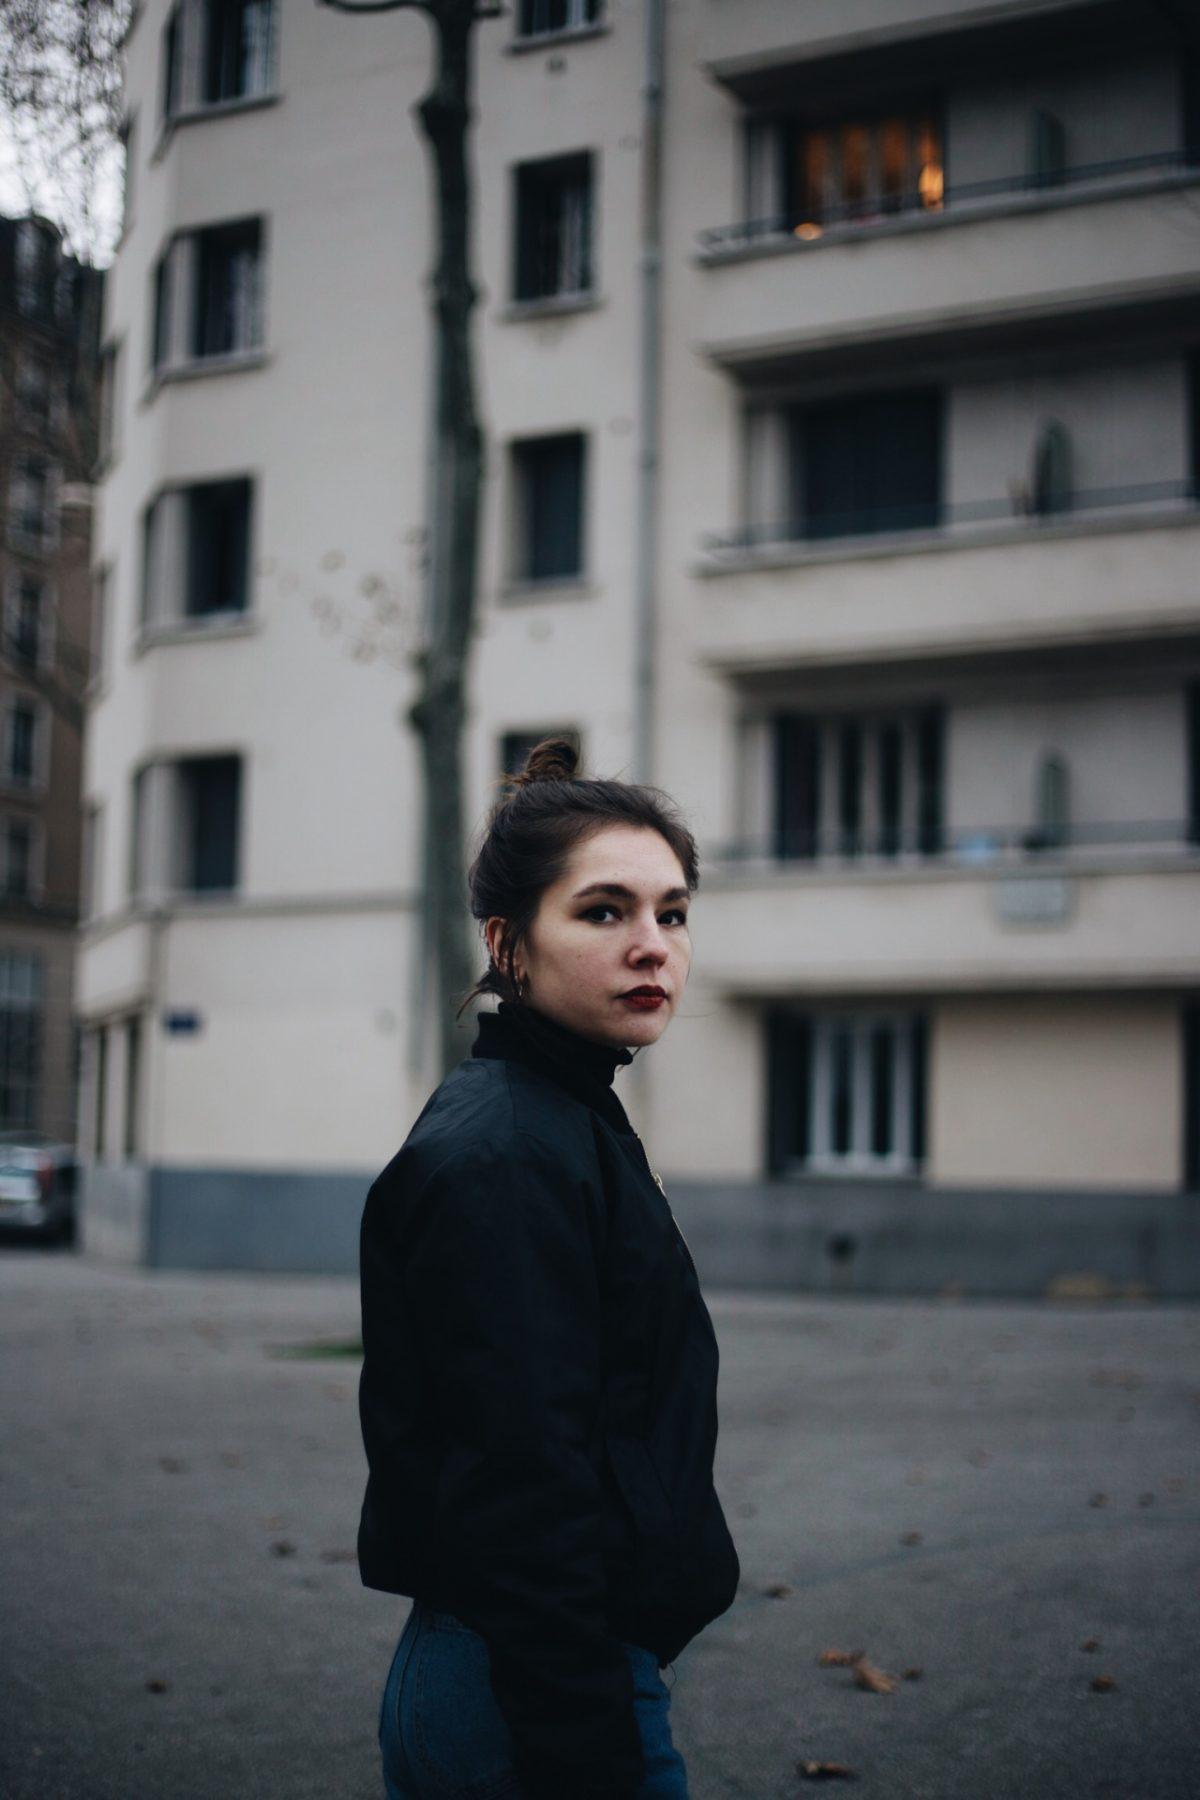 © Chloé Ciccolophoto